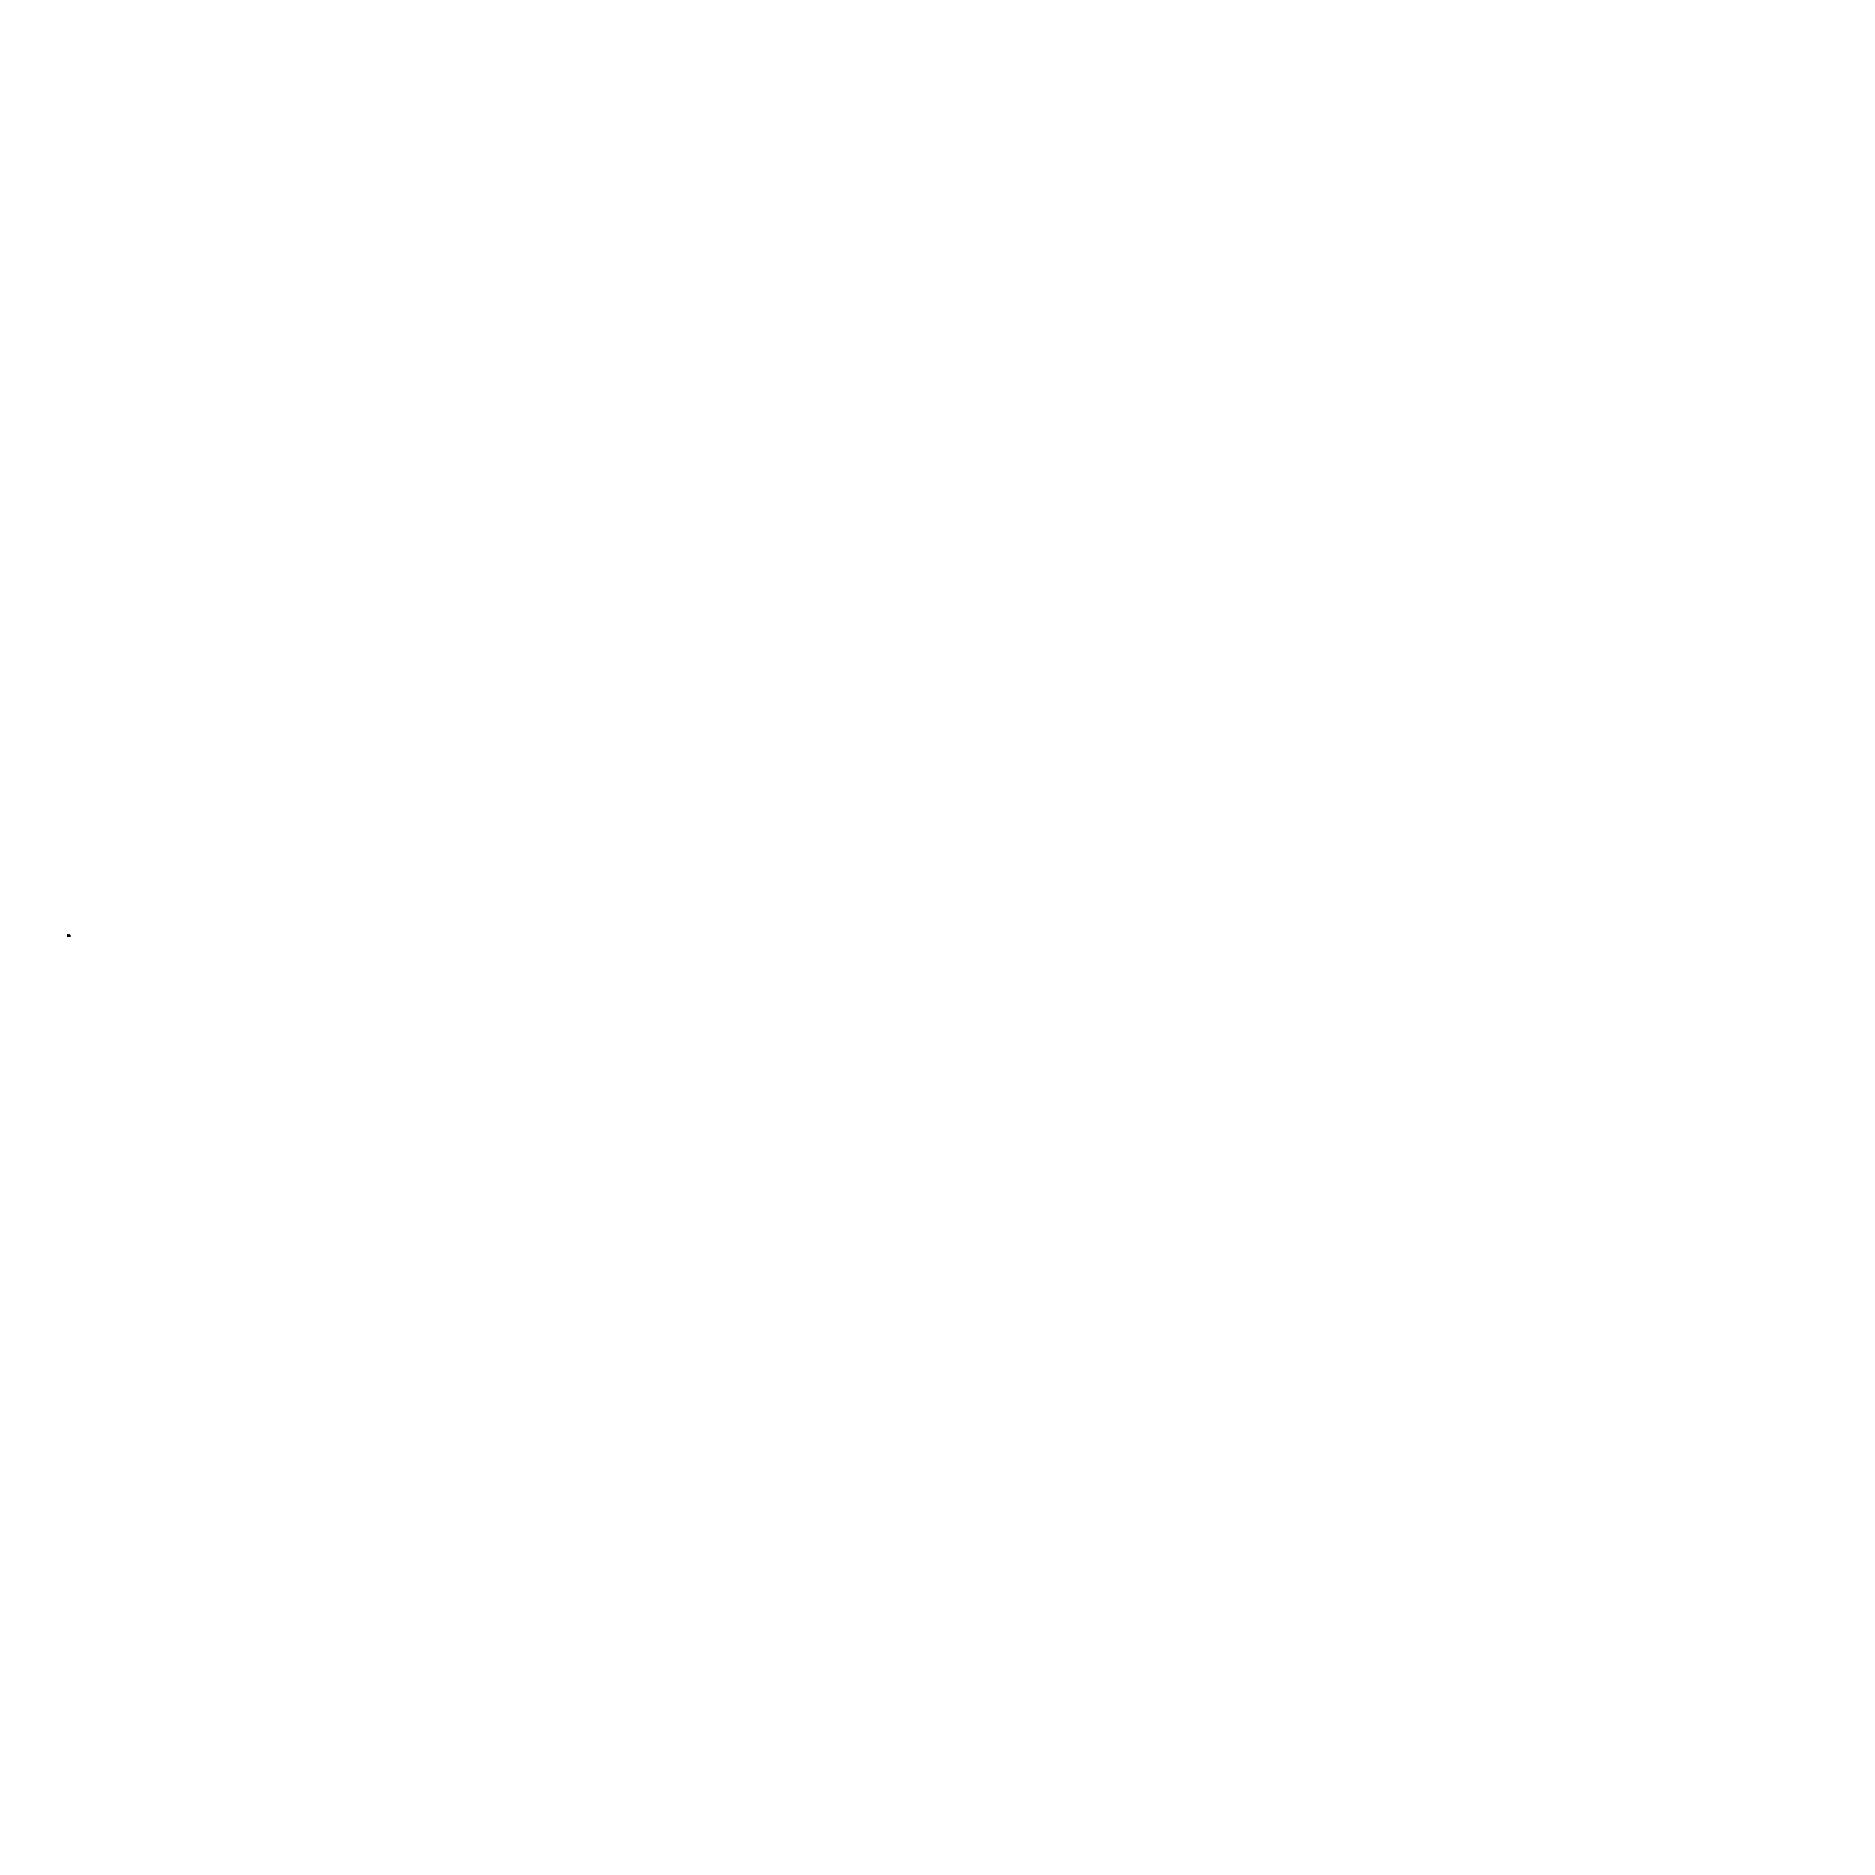 The Jane Goodall Foundation Logo